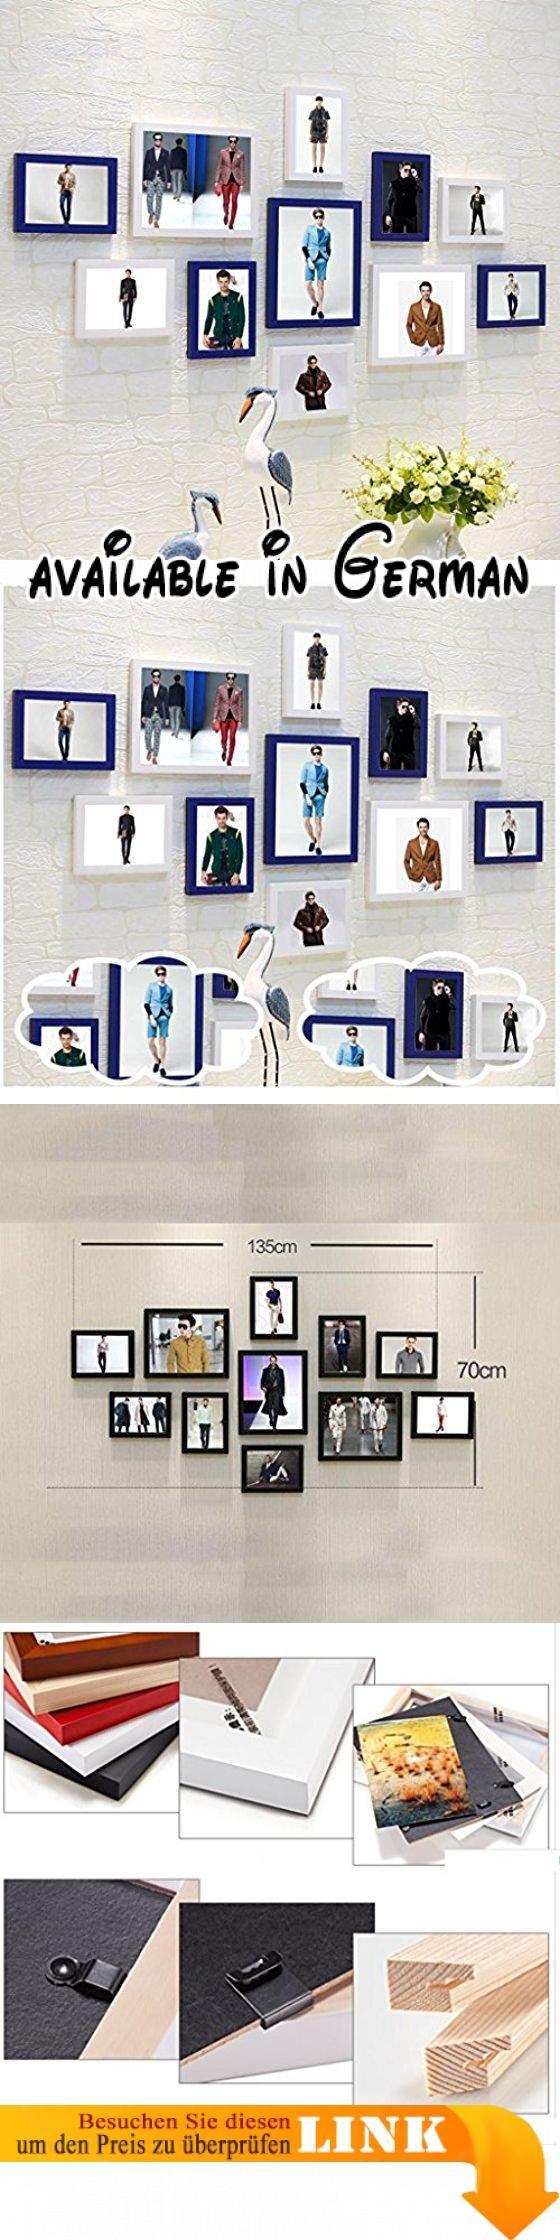 & Wandmontage Design Wohnzimmer Bilderrahmen Wand, Kreative Wand ...